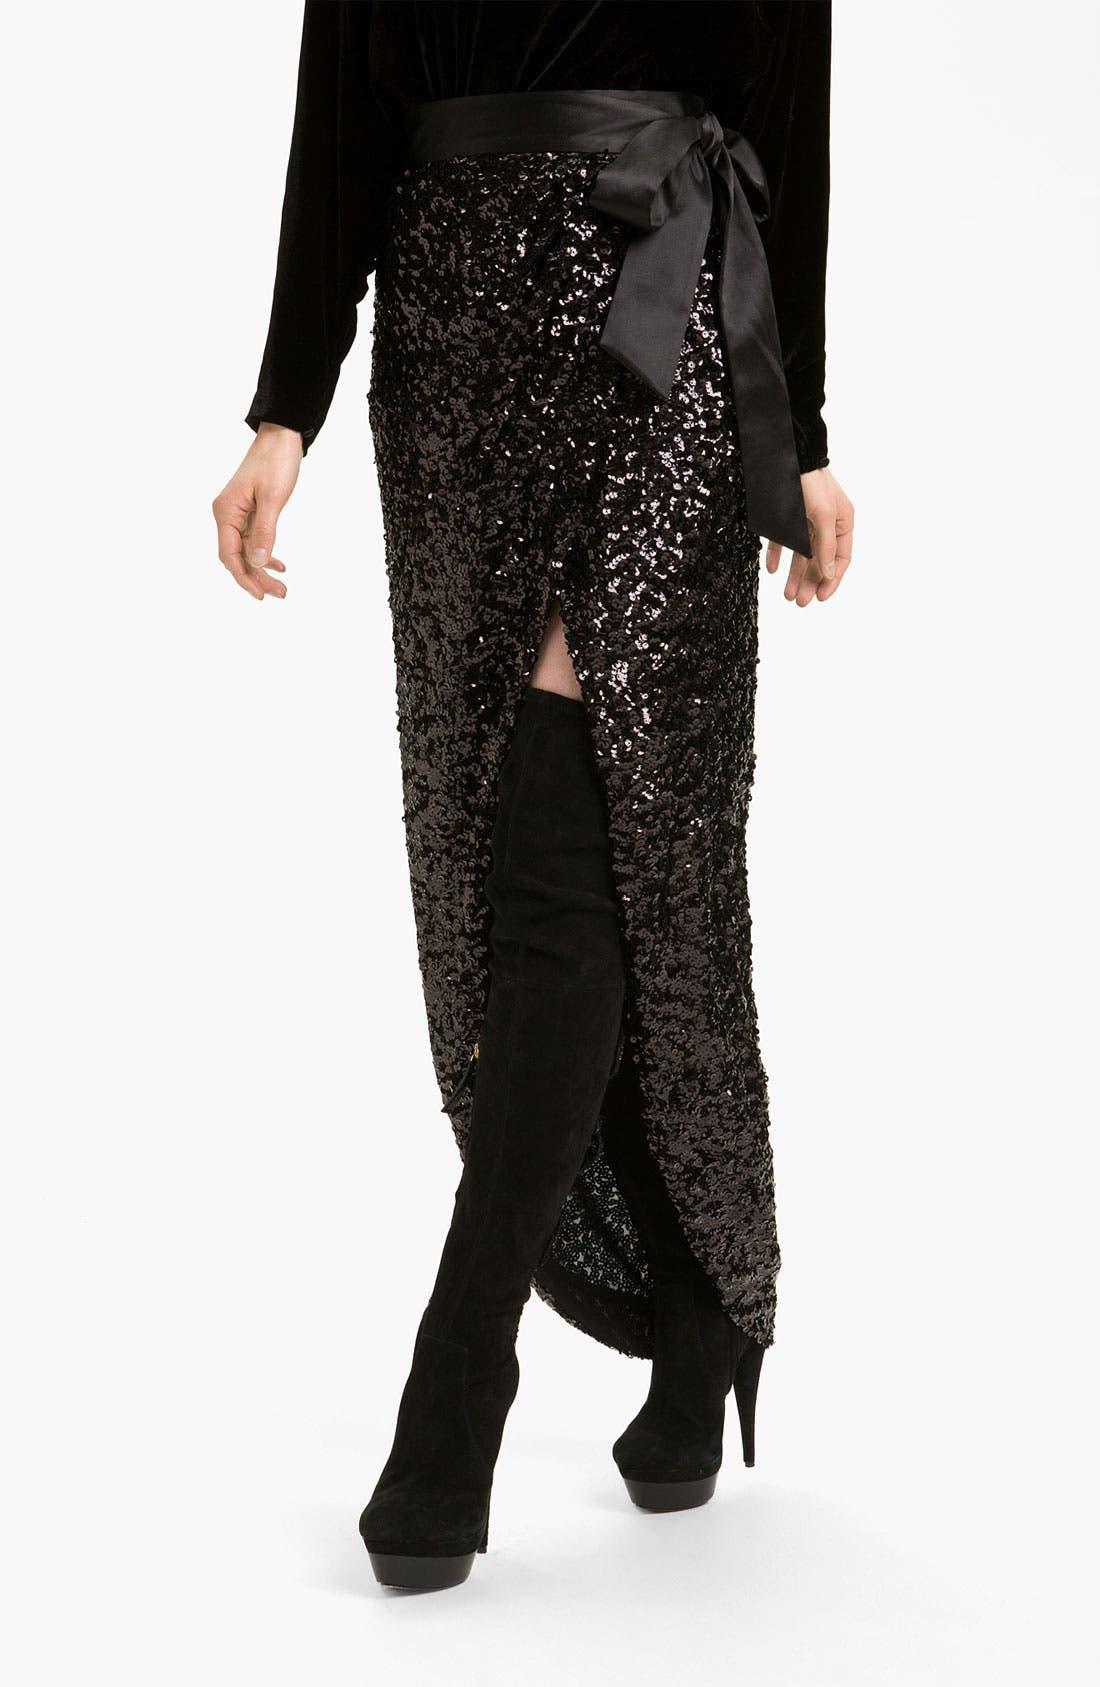 Alternate Image 1 Selected - Rachel Zoe 'Abbey' Sequin Maxi Skirt